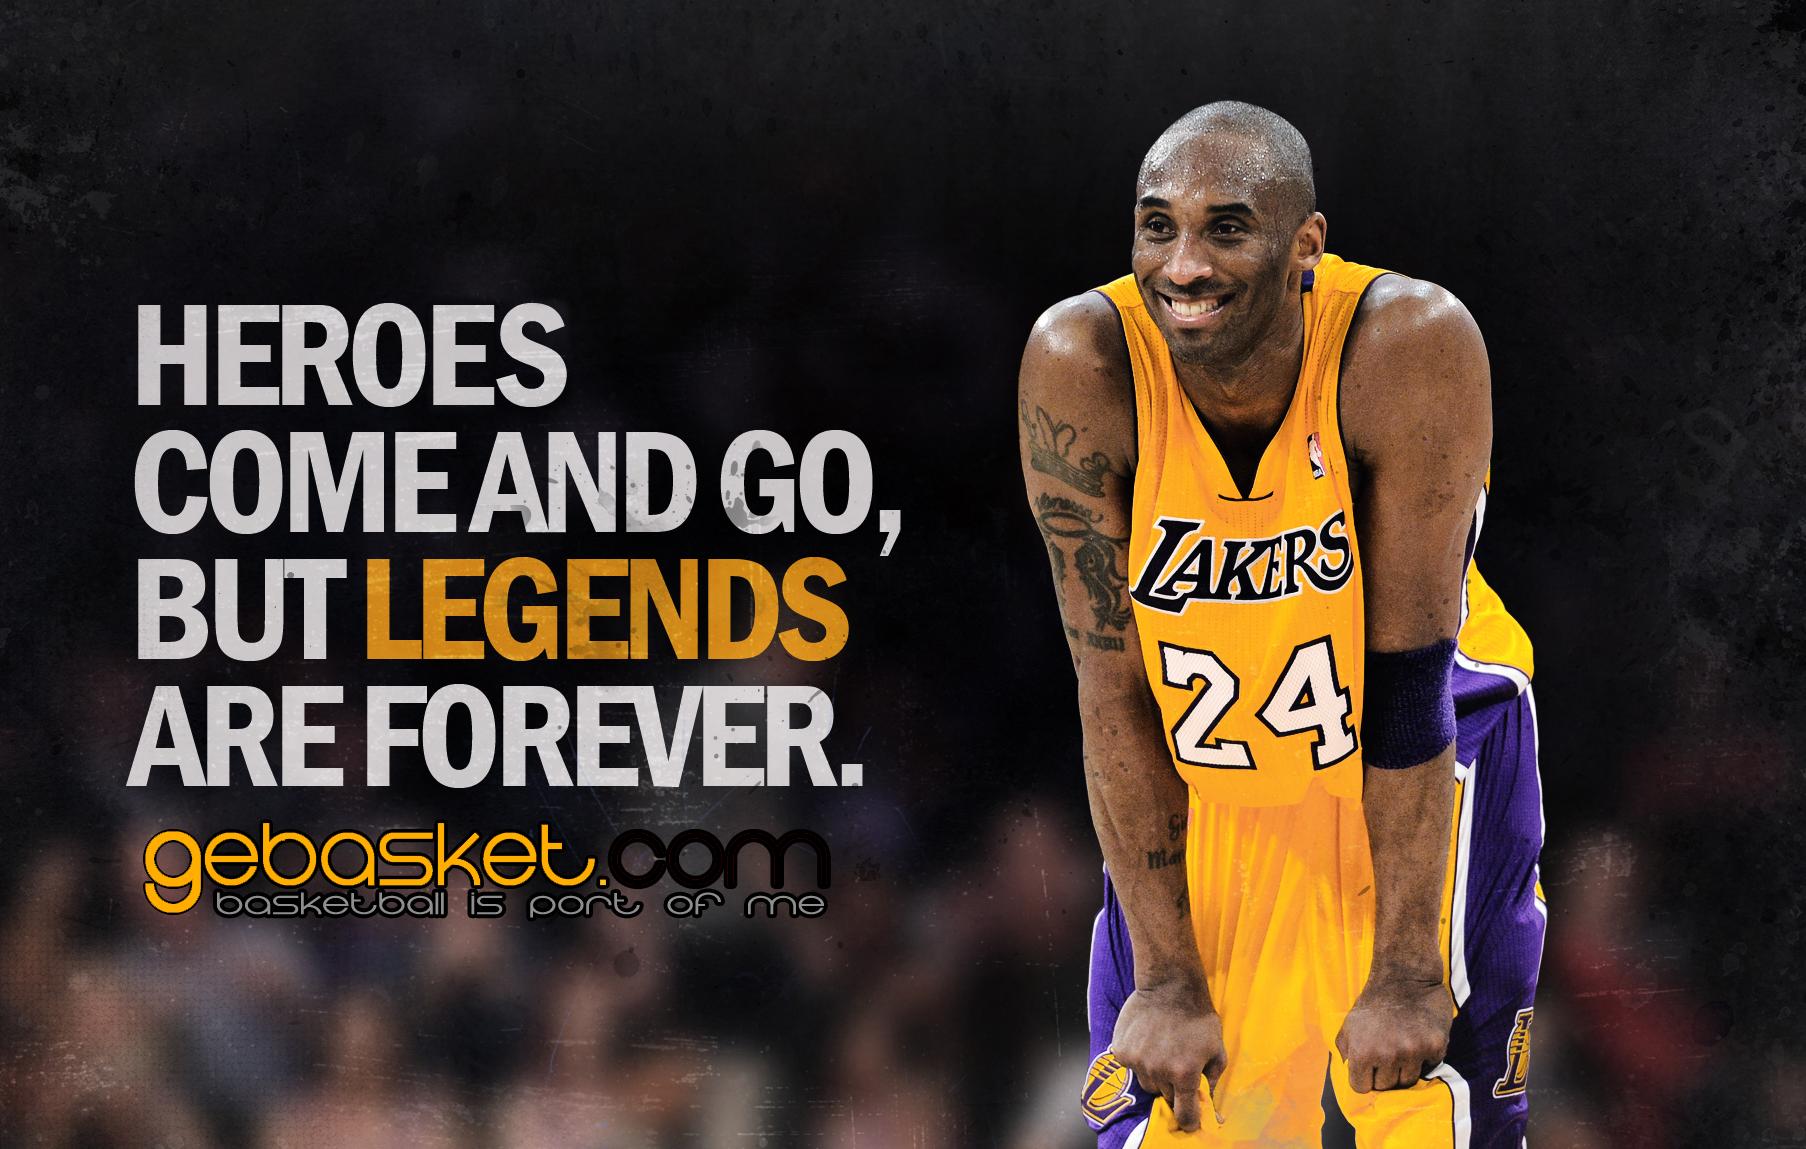 Kobe Bryant Quotes Awesome Kobe Bryant  Nba Legends  Pinterest  Kobe Bryant Kobe And Nba Decorating Design